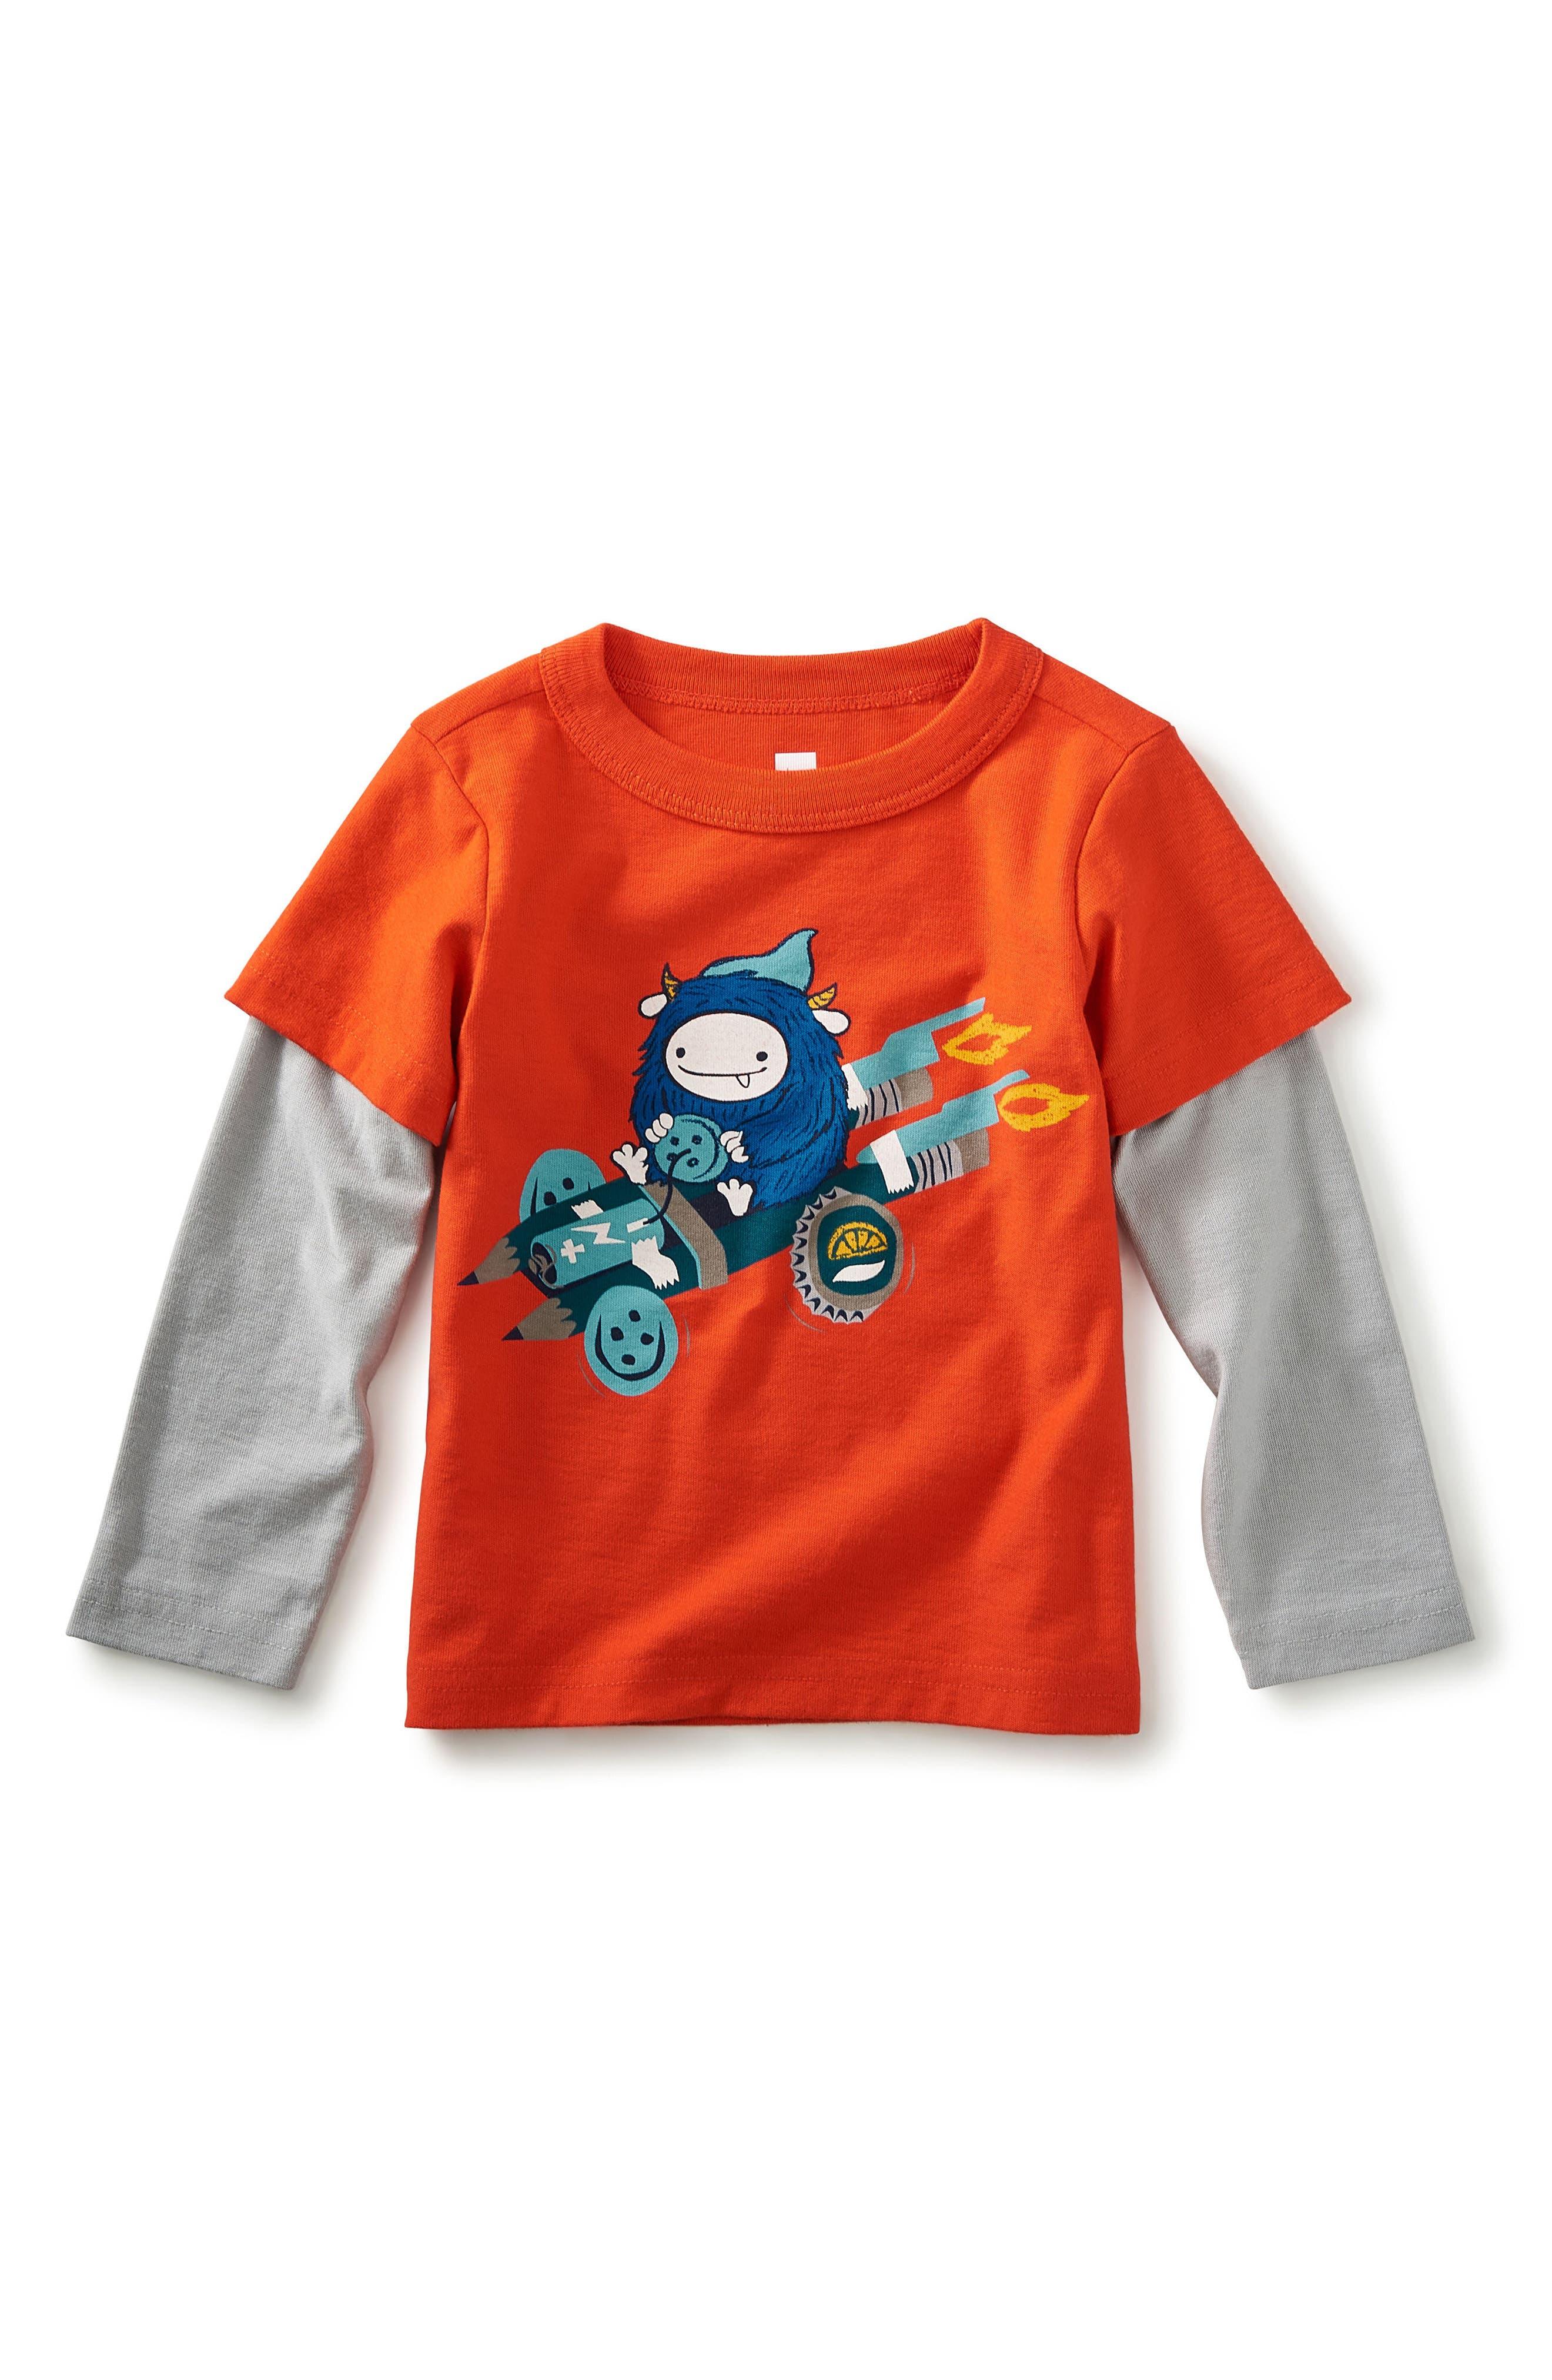 Main Image - Tea Collection Browniemobile Graphic T-Shirt (Baby Boys)